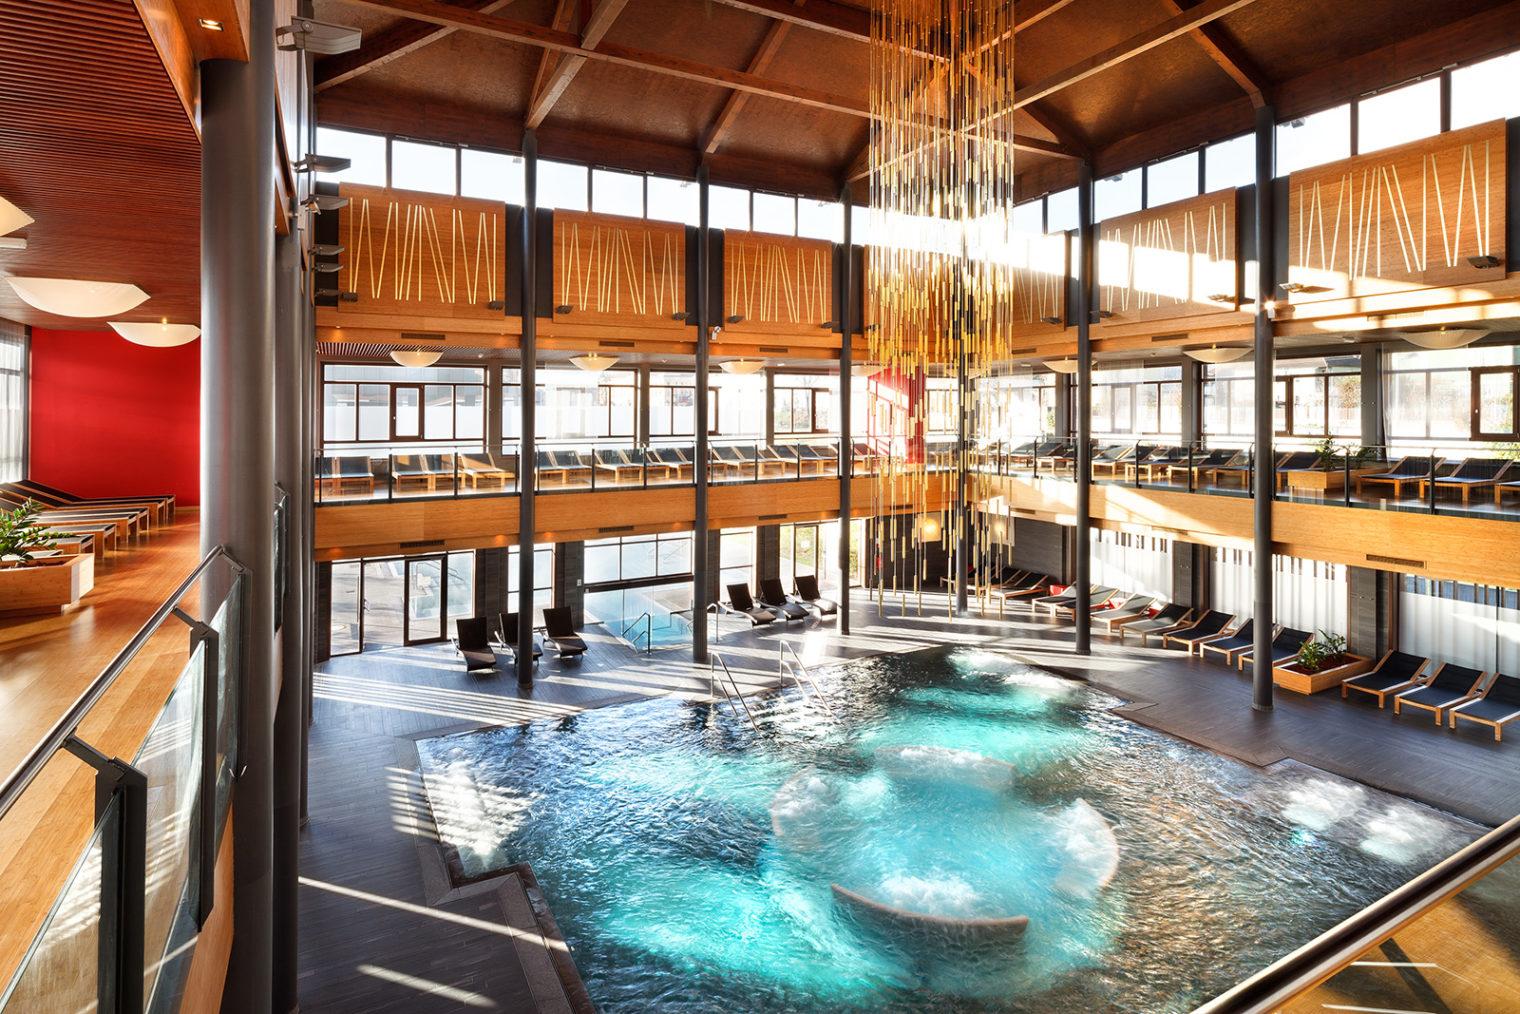 Entspannungspool Asia Spa Innenbereich